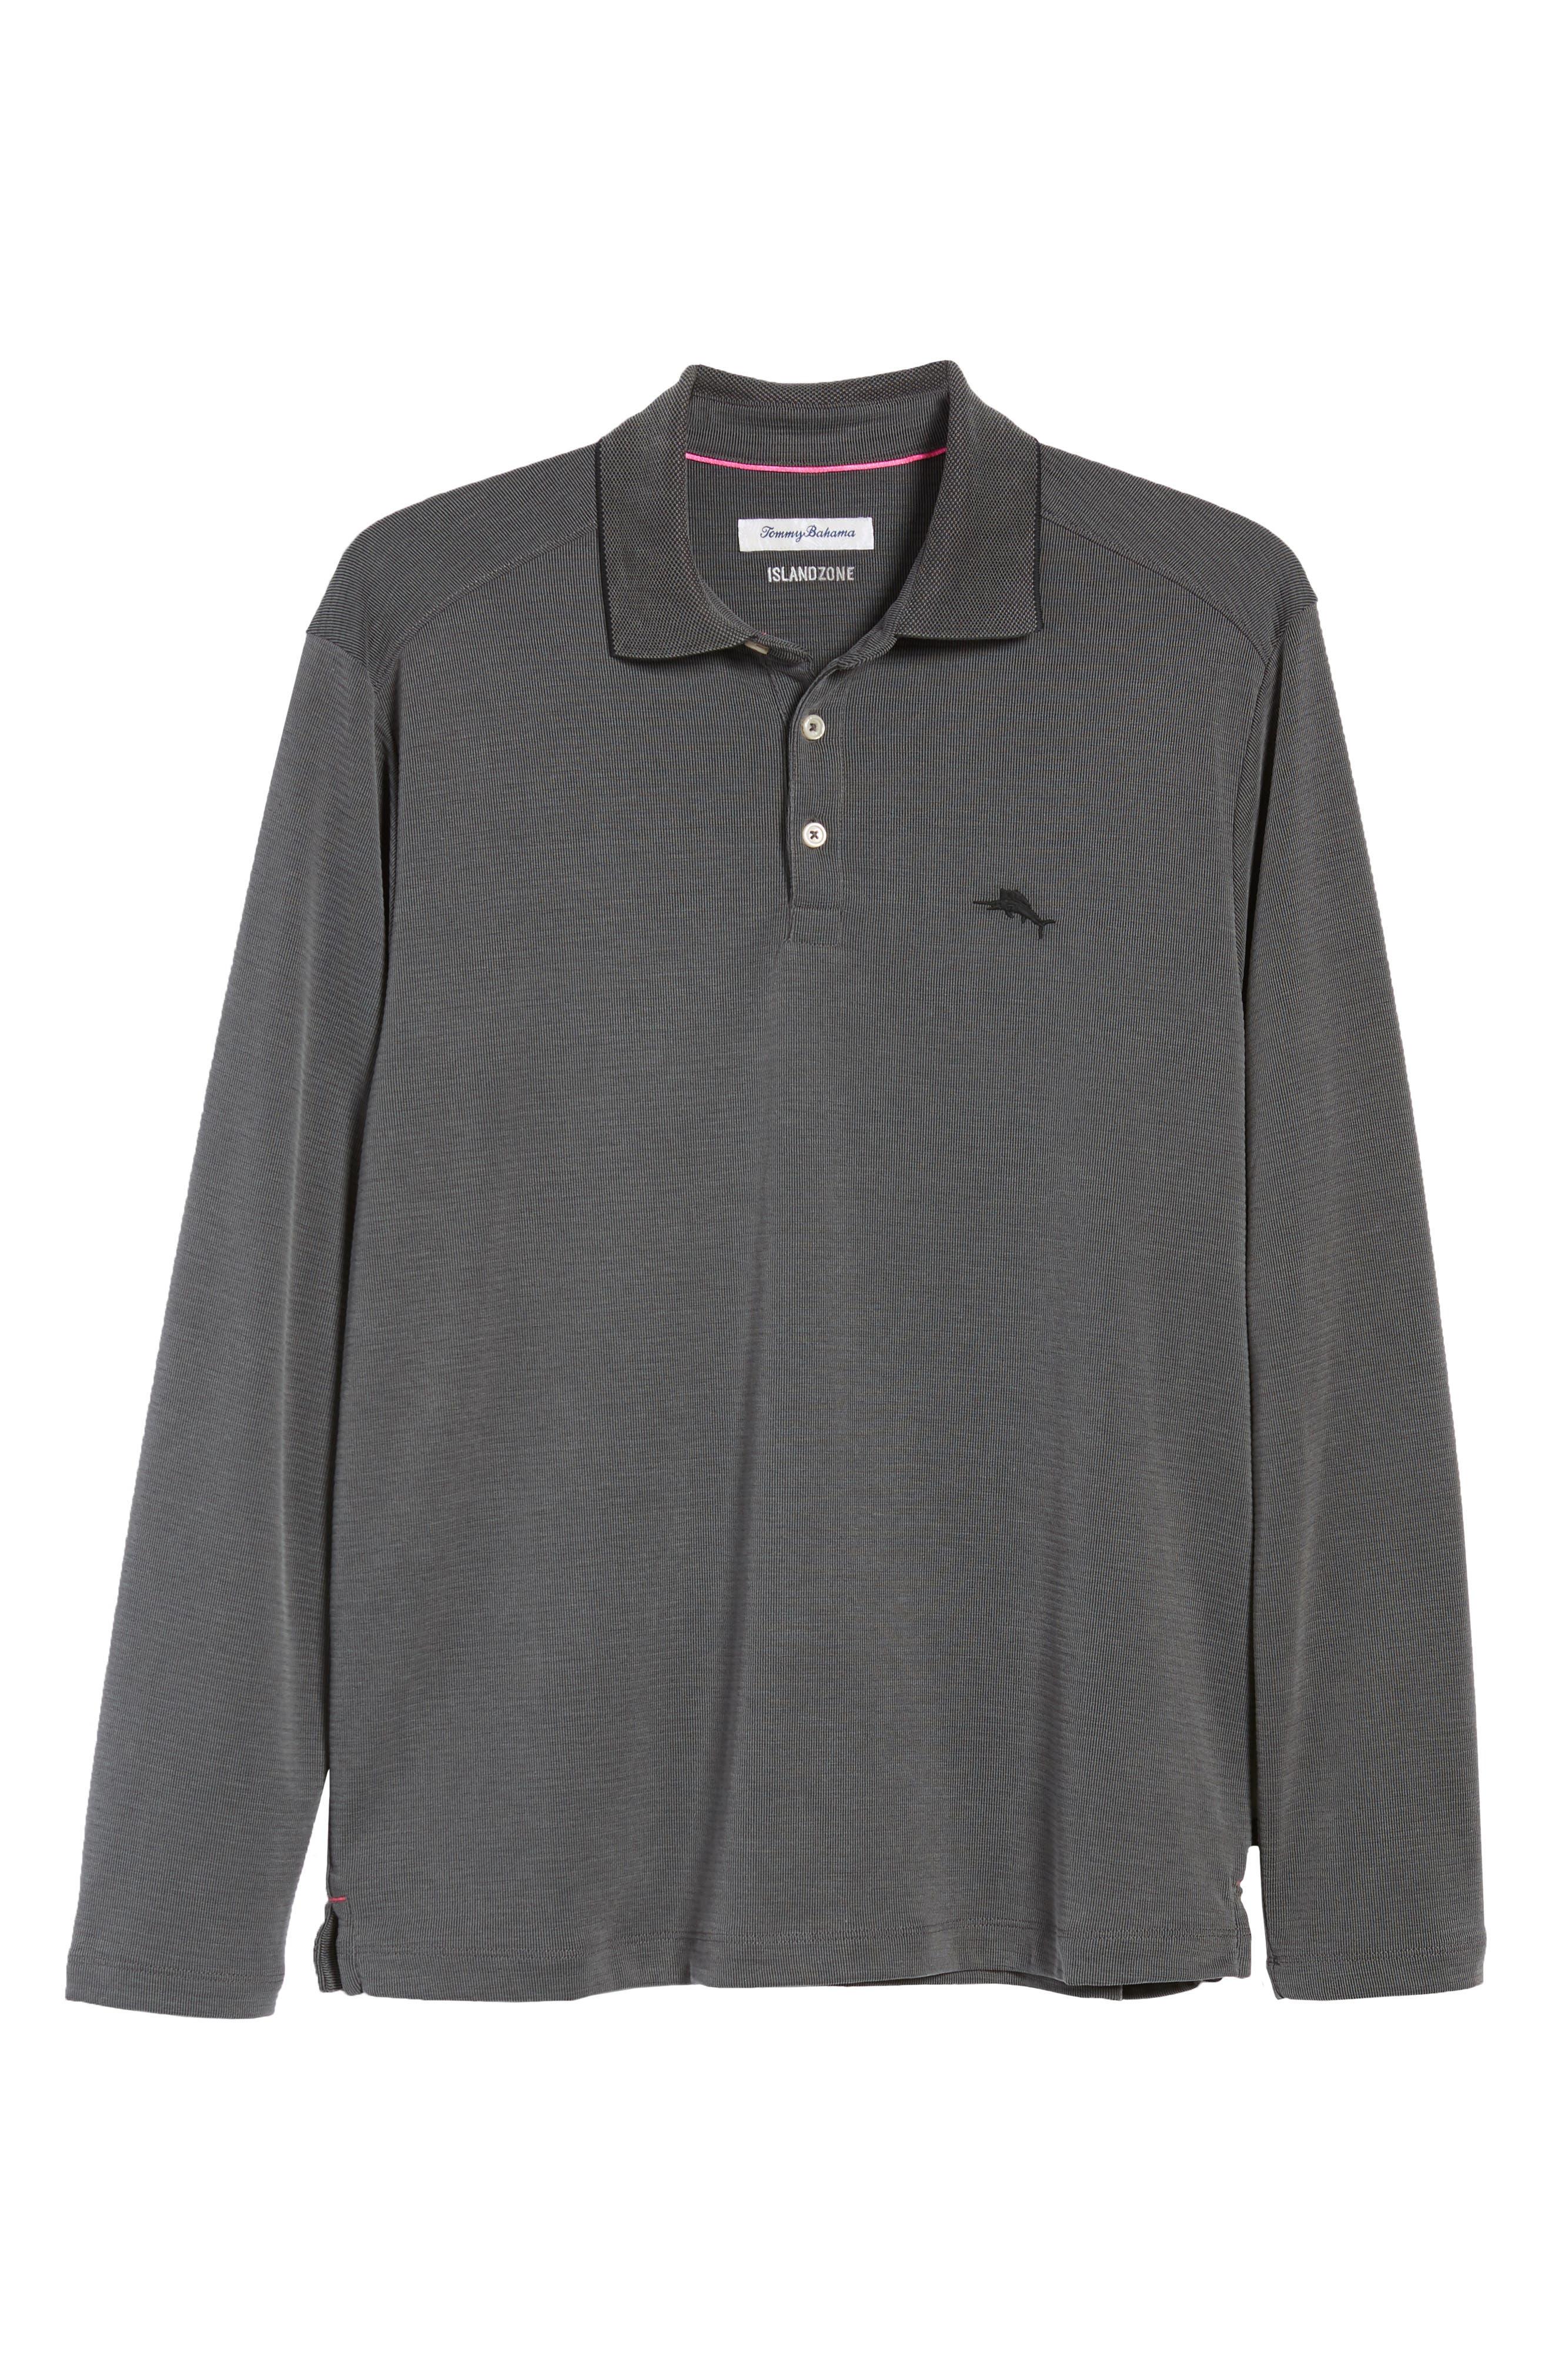 TOMMY BAHAMA, Coastal Crest Regular Fit Polo, Alternate thumbnail 6, color, BLACK